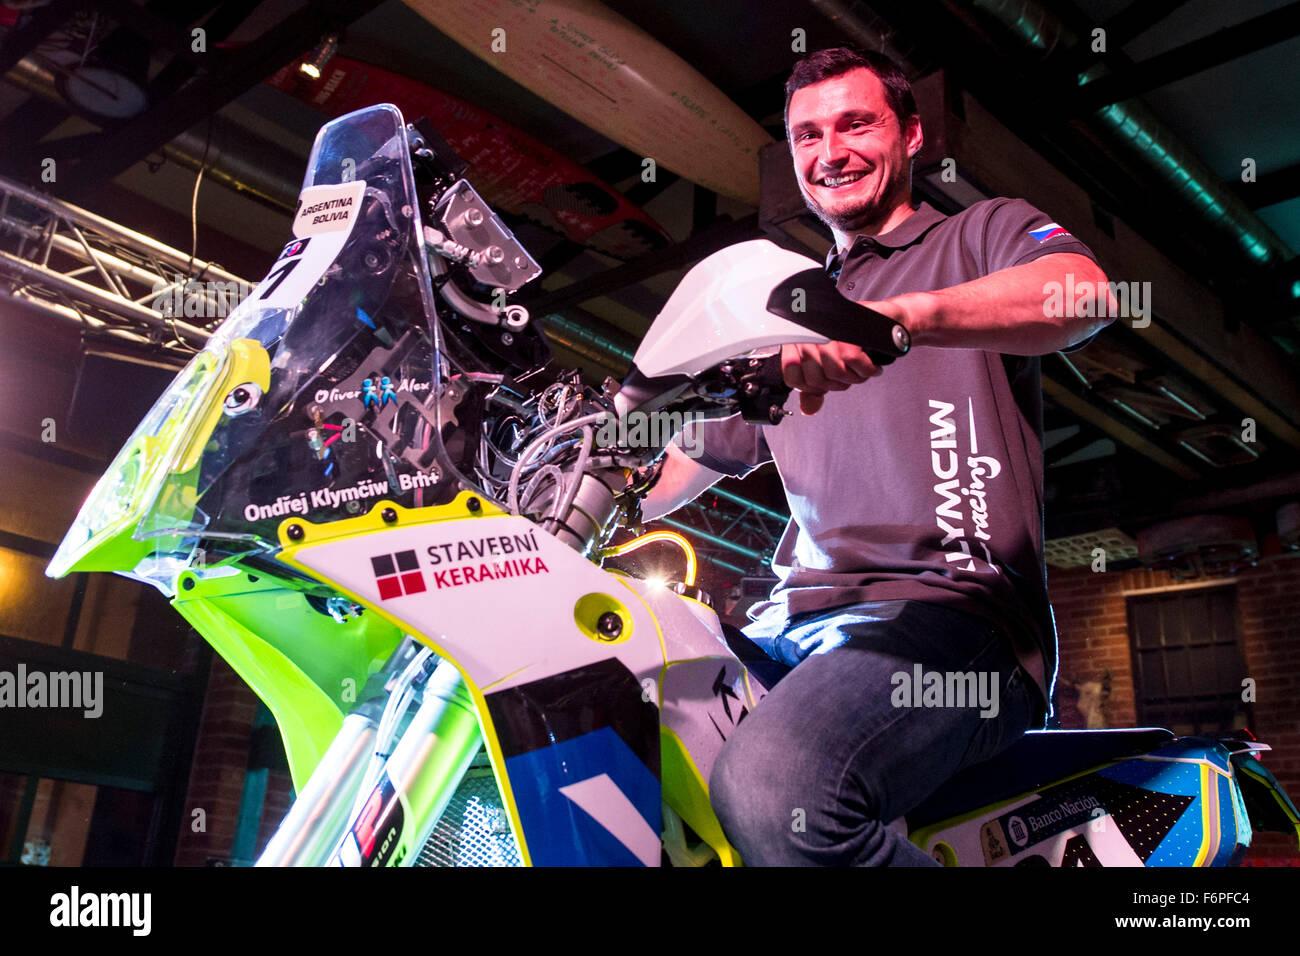 Pardubice, Czech Republic. 18th Nov, 2015. Klymciw Racing Team driver Ondrej Klymciw presents racing motorbike Husqvarna - Stock Image